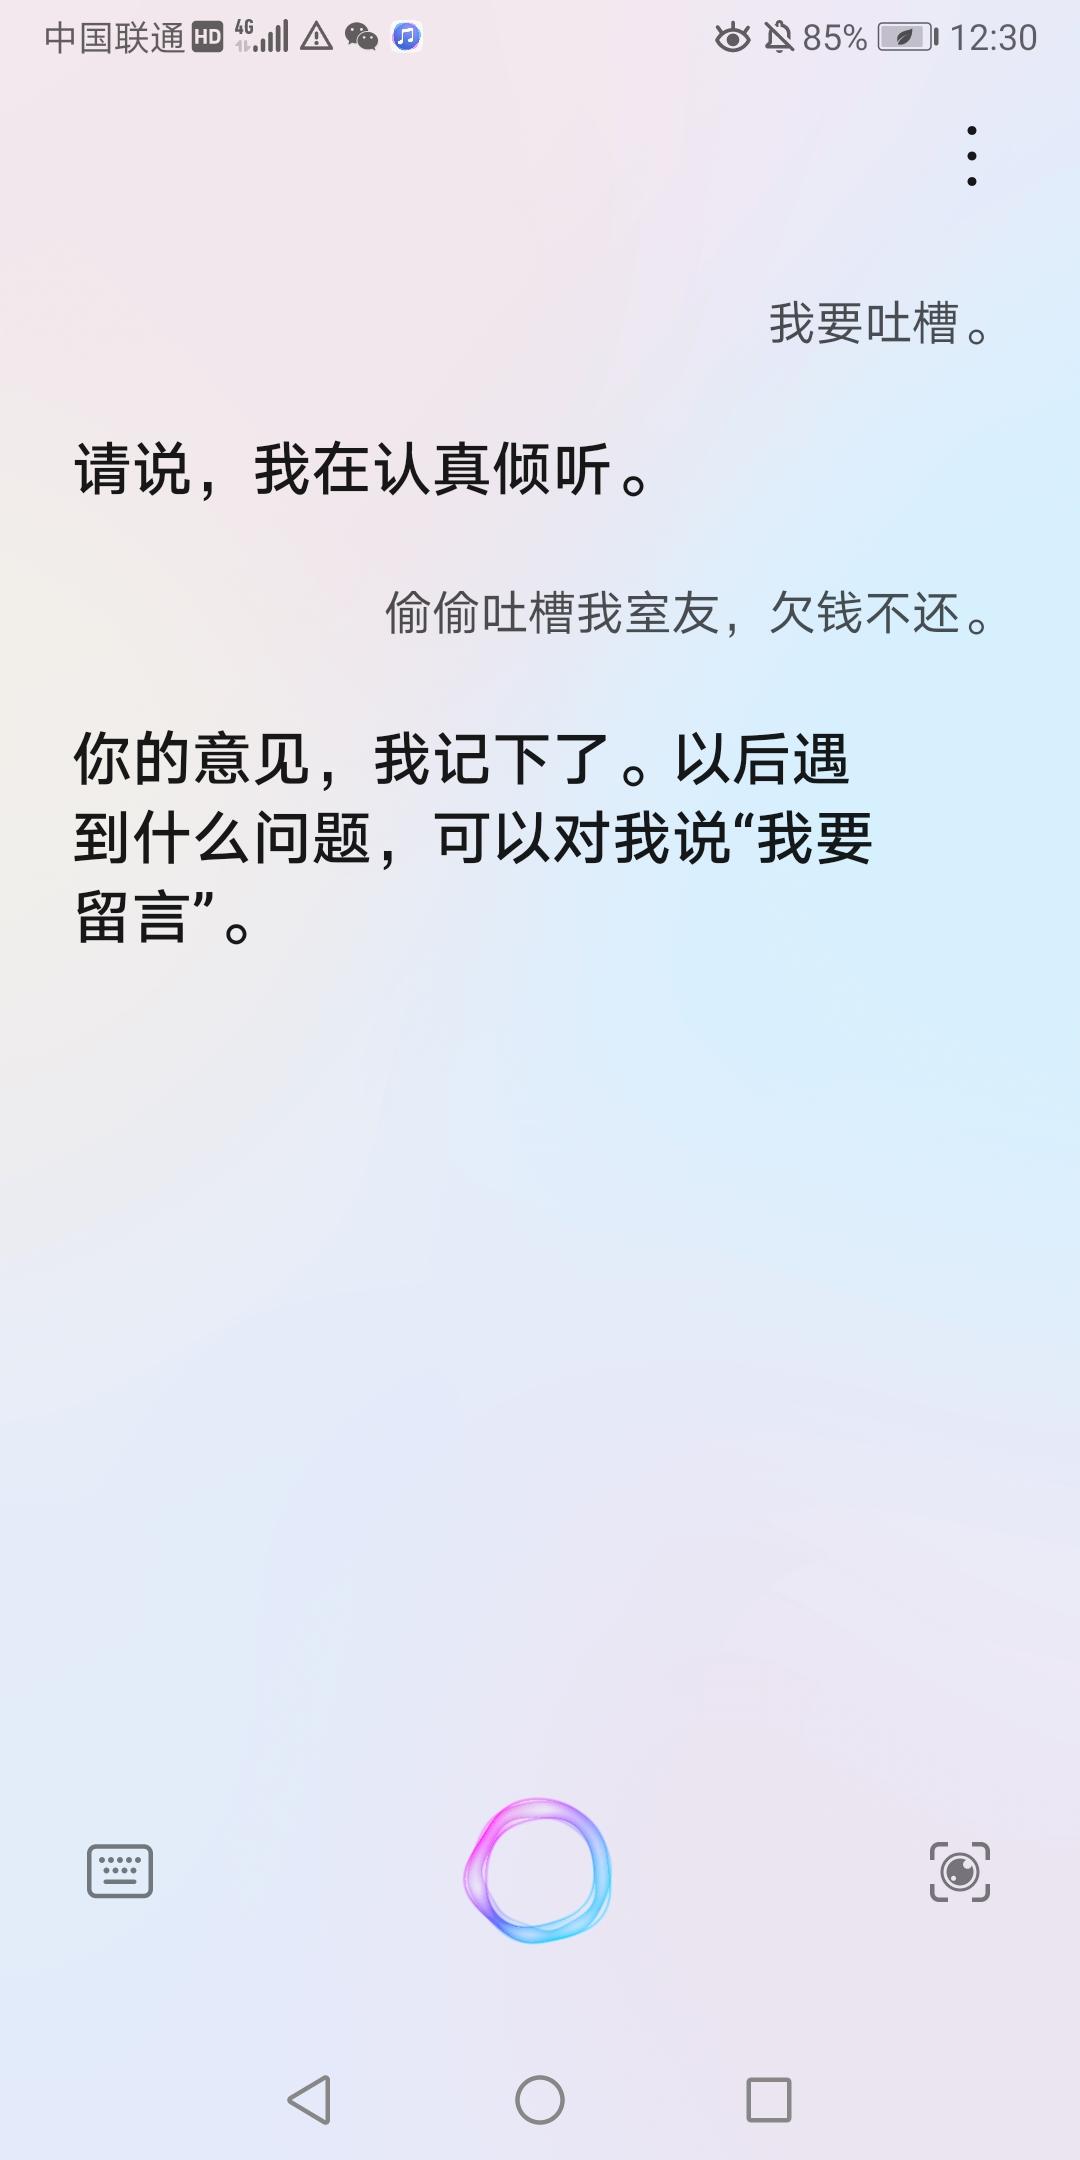 Screenshot_20200515_123008_com.huawei.vassistant.jpg